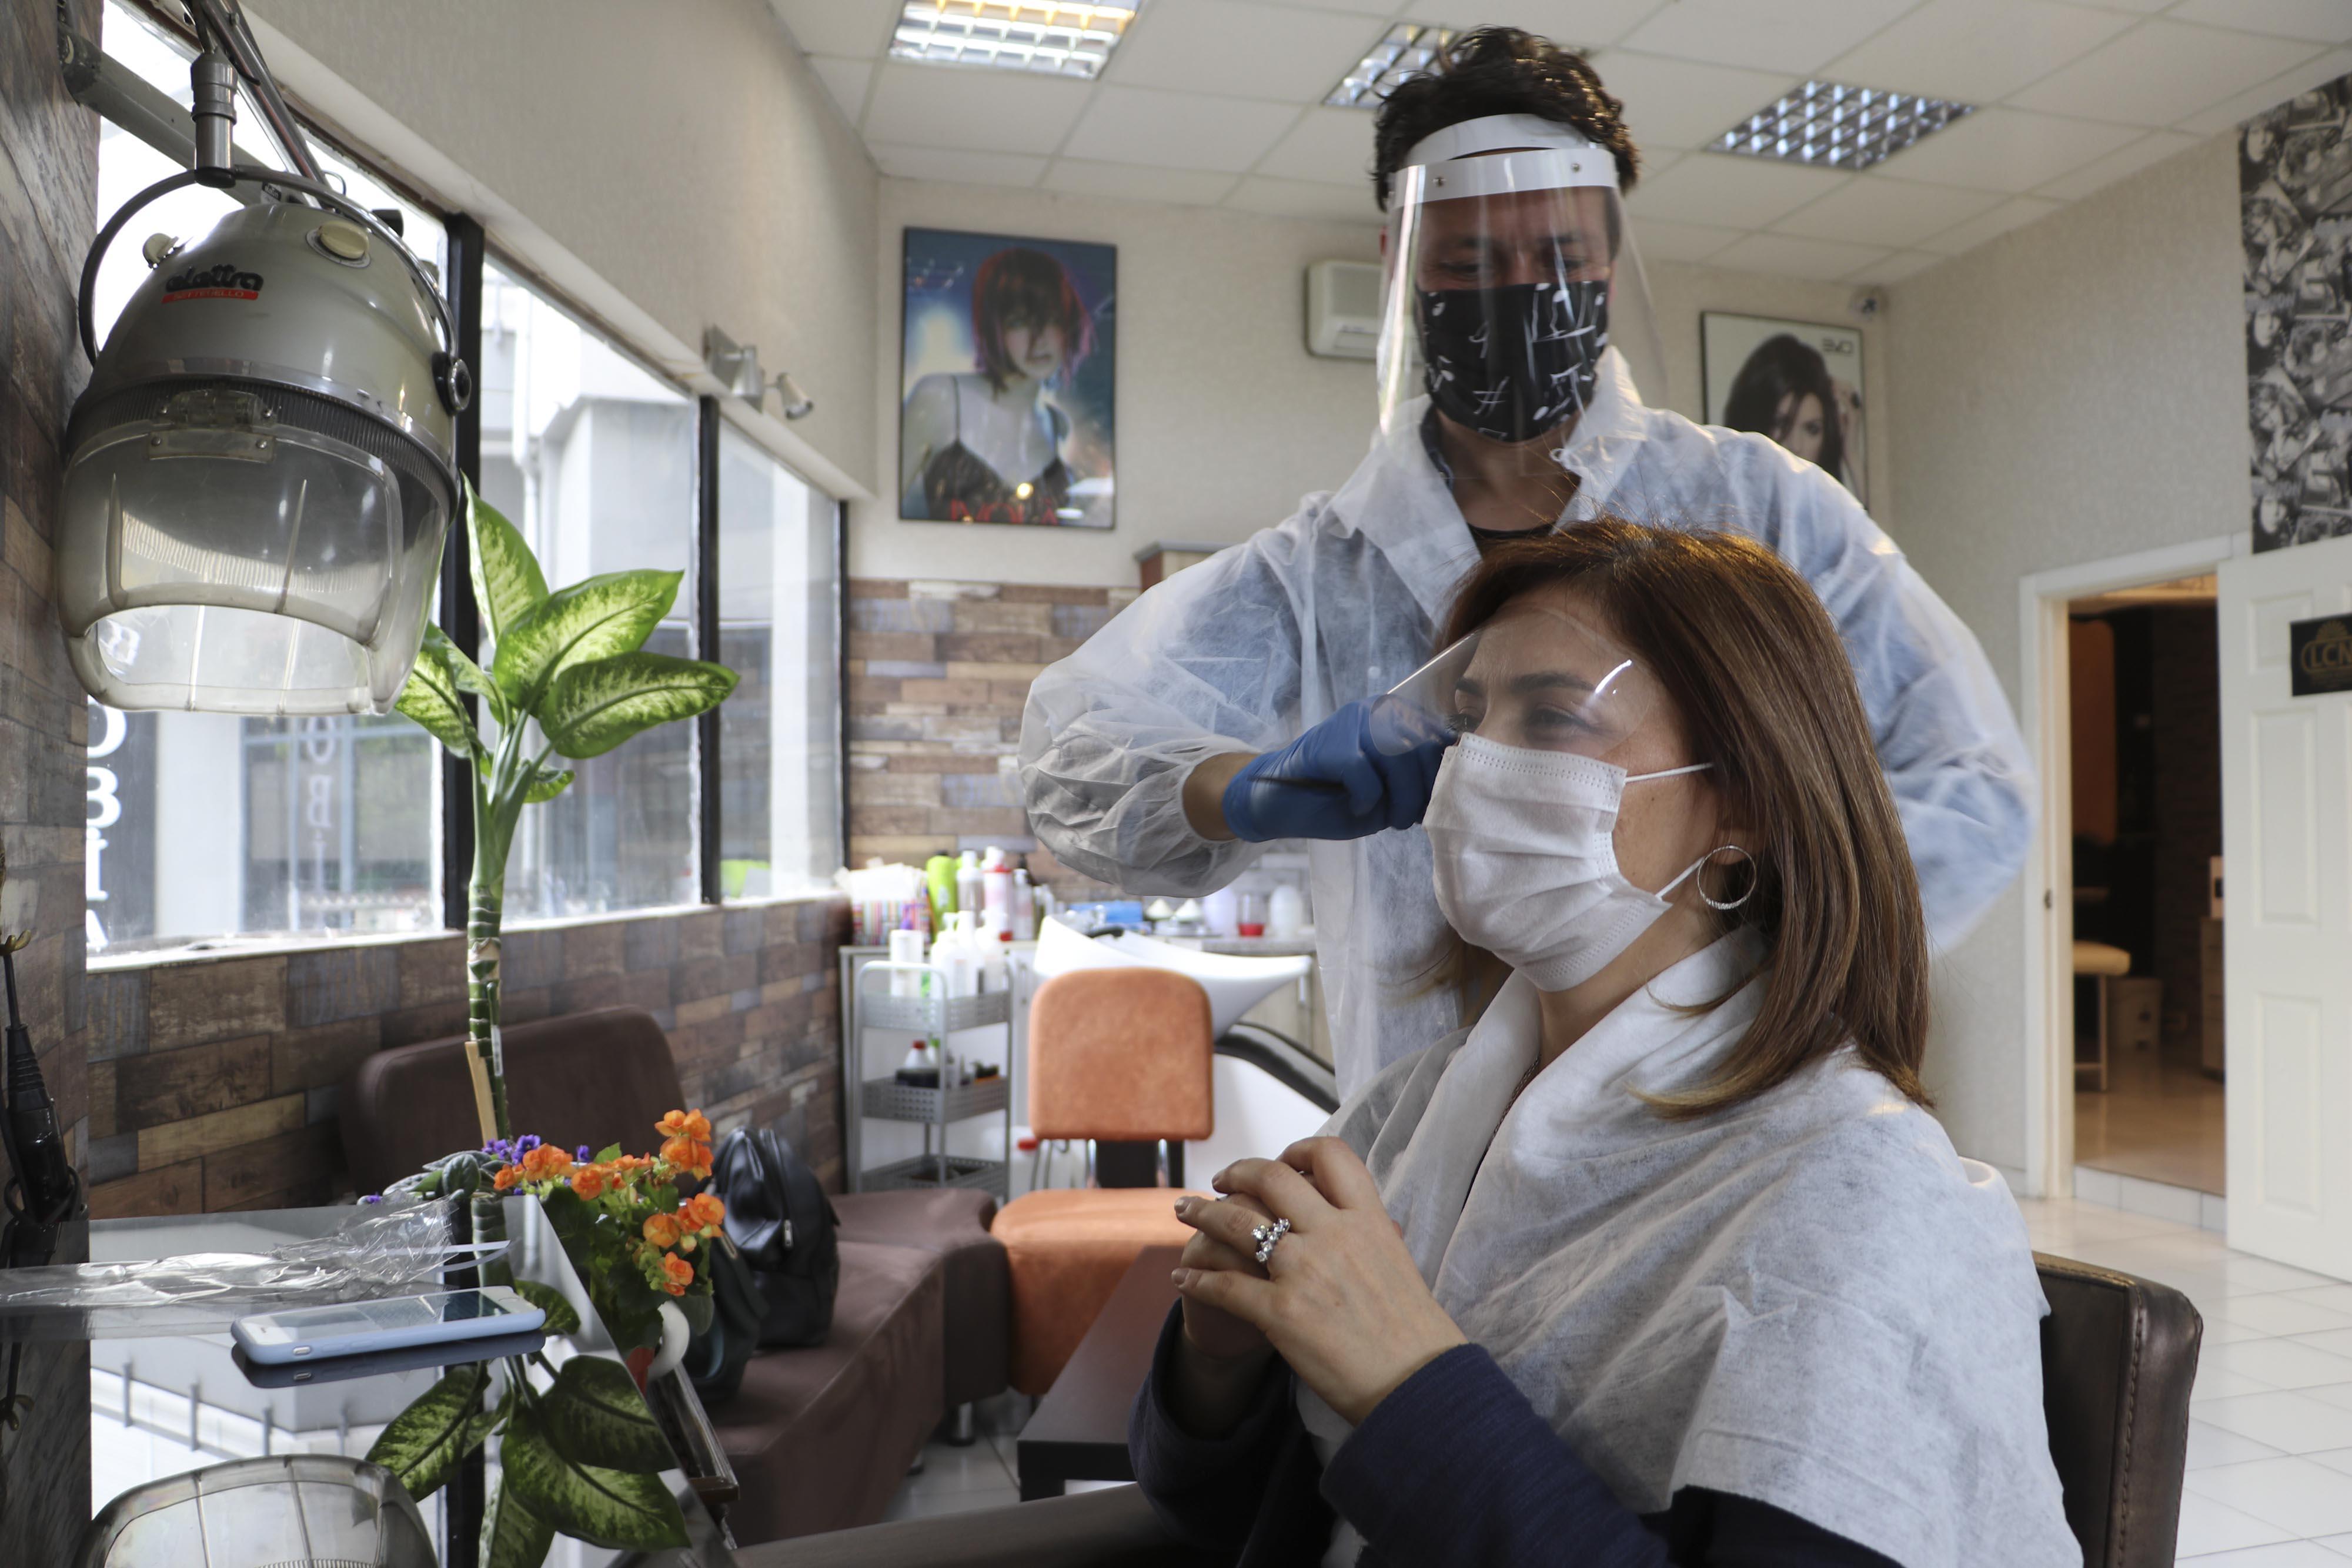 pandemi-surecinde-makyaj-yapan-ve-yaptiran-kisi-icin-riskli-3070-dhaphoto6.jpg